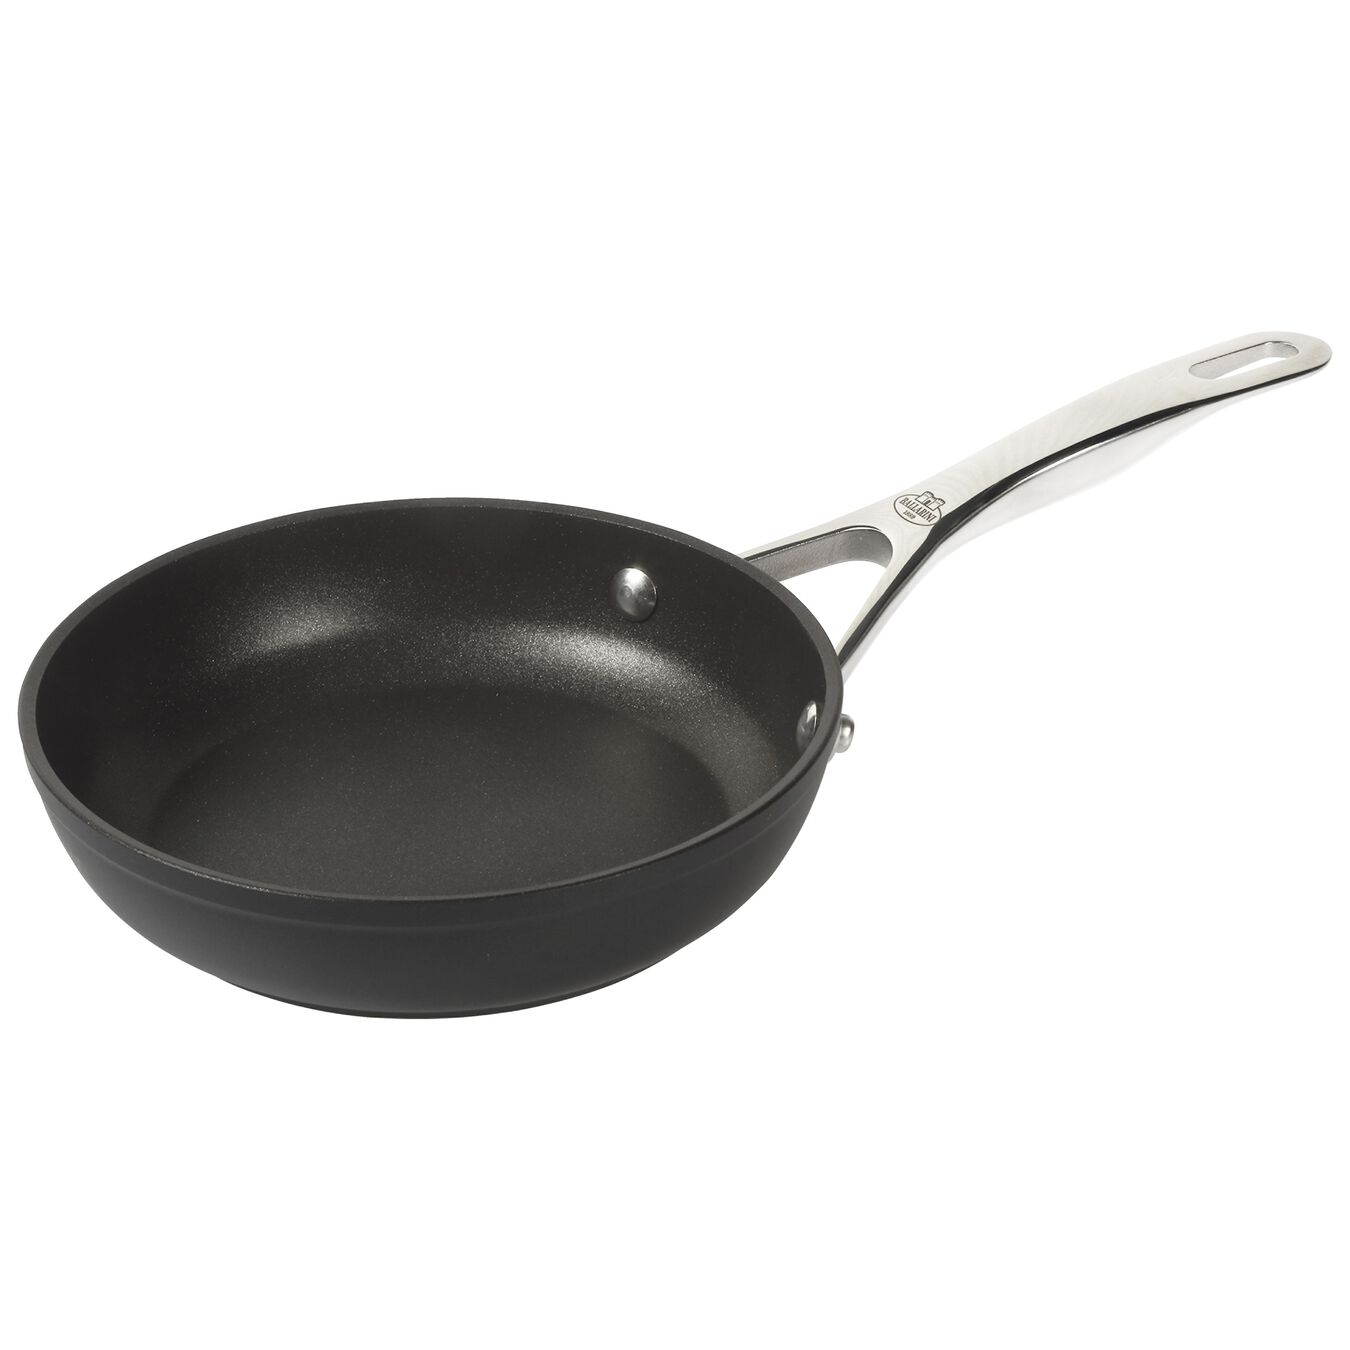 20 cm / 8 inch Aluminum Frying pan,,large 1